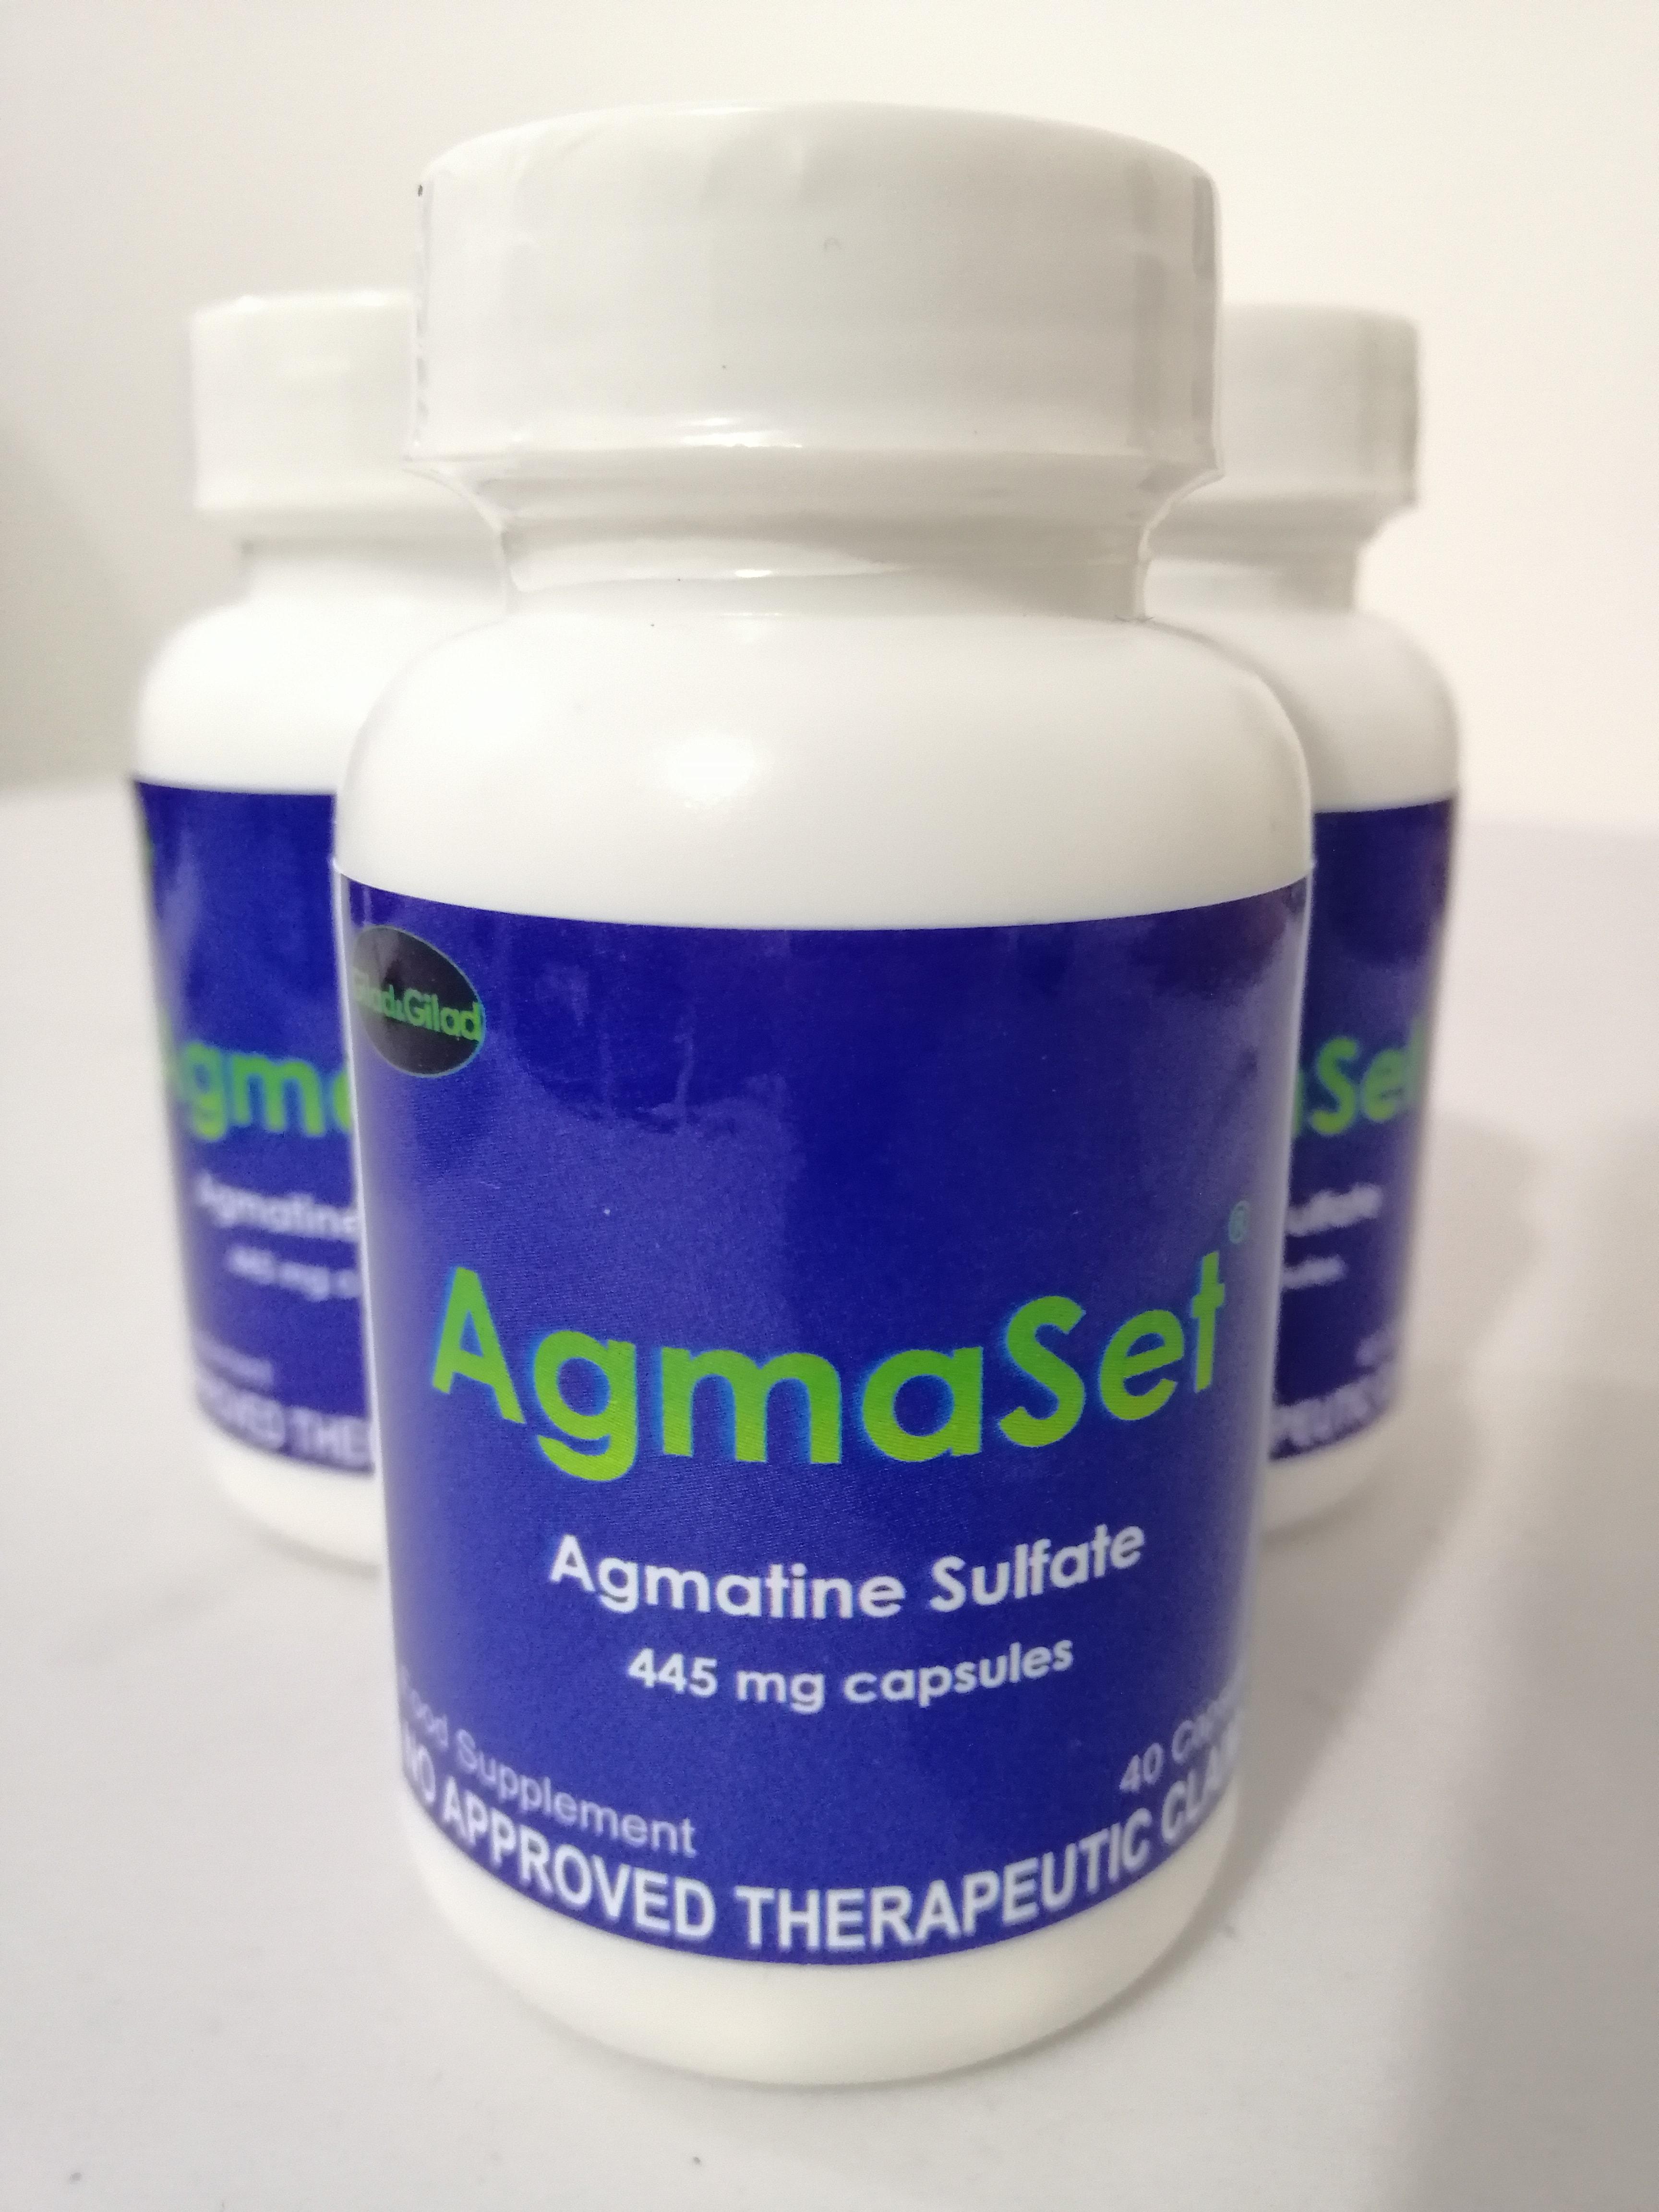 Agmaset (Agmatine Sulfate) 445mg 40 Capsules